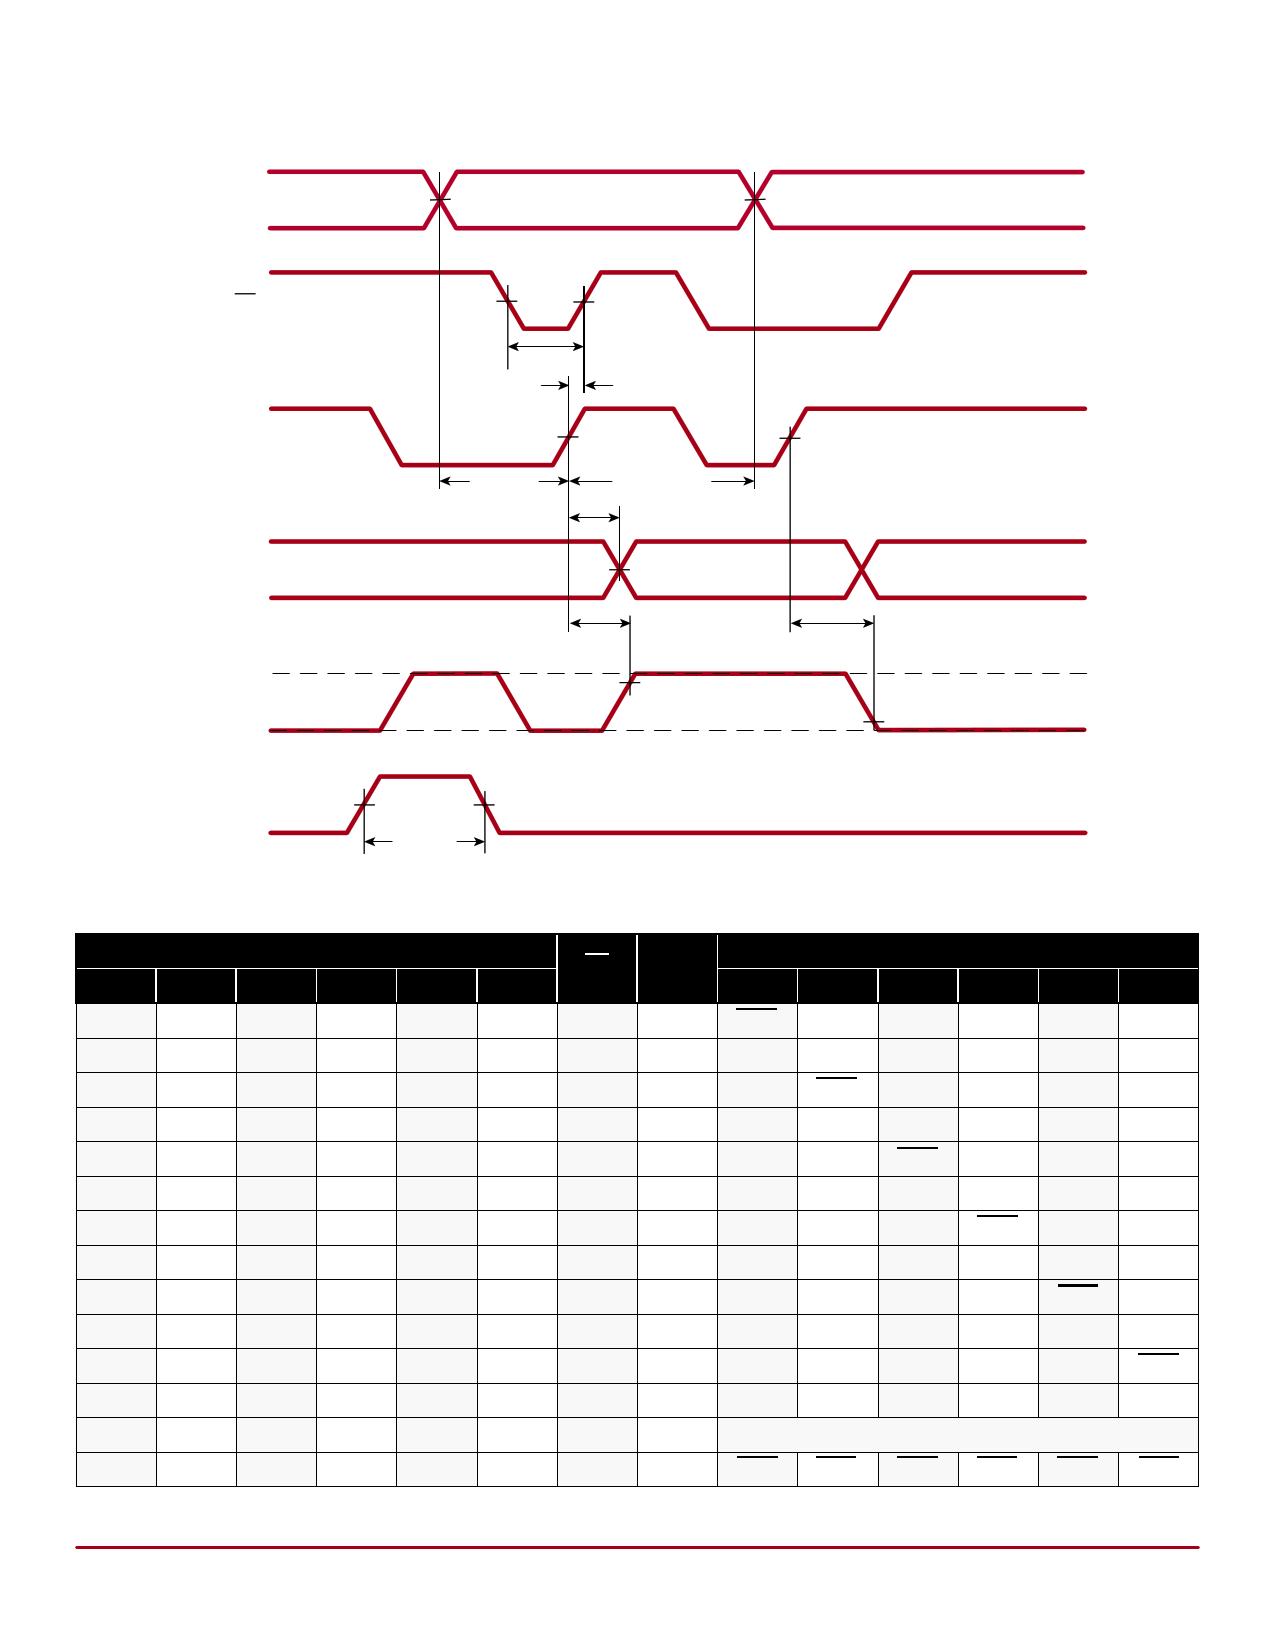 HV209FG 電子部品, 半導体